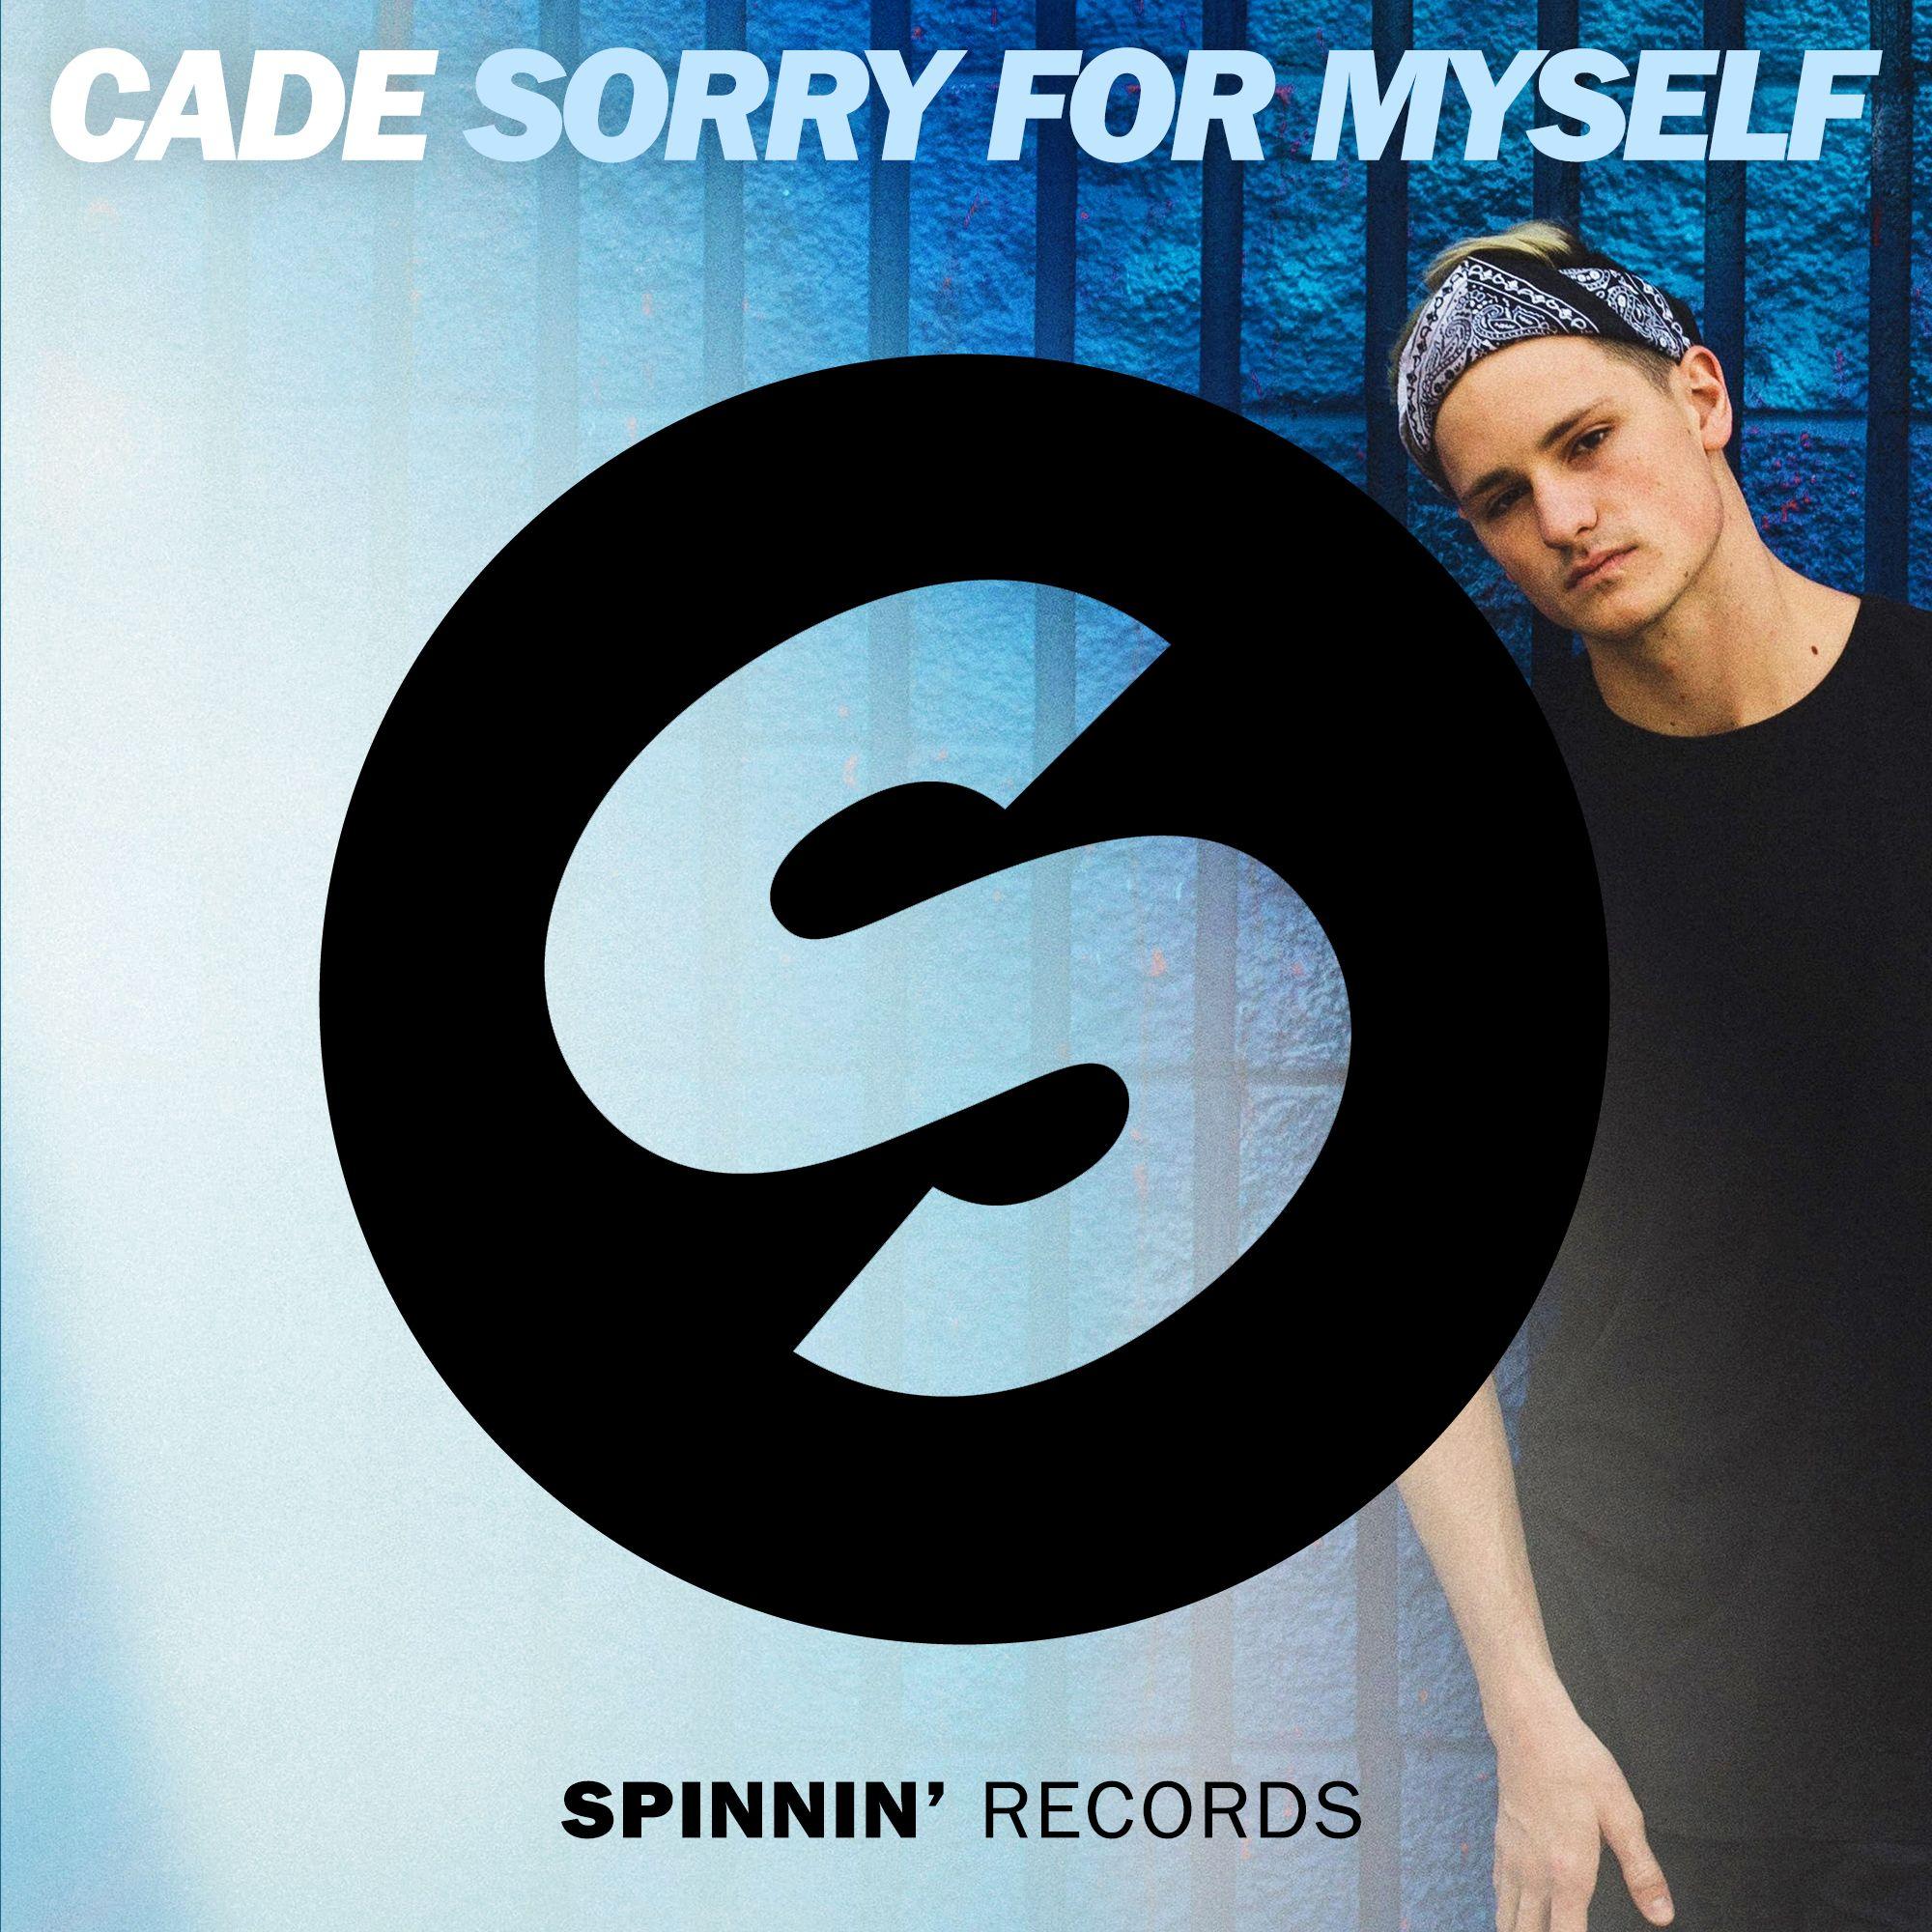 spinnin_cade_-_sorry_for_myself.jpg